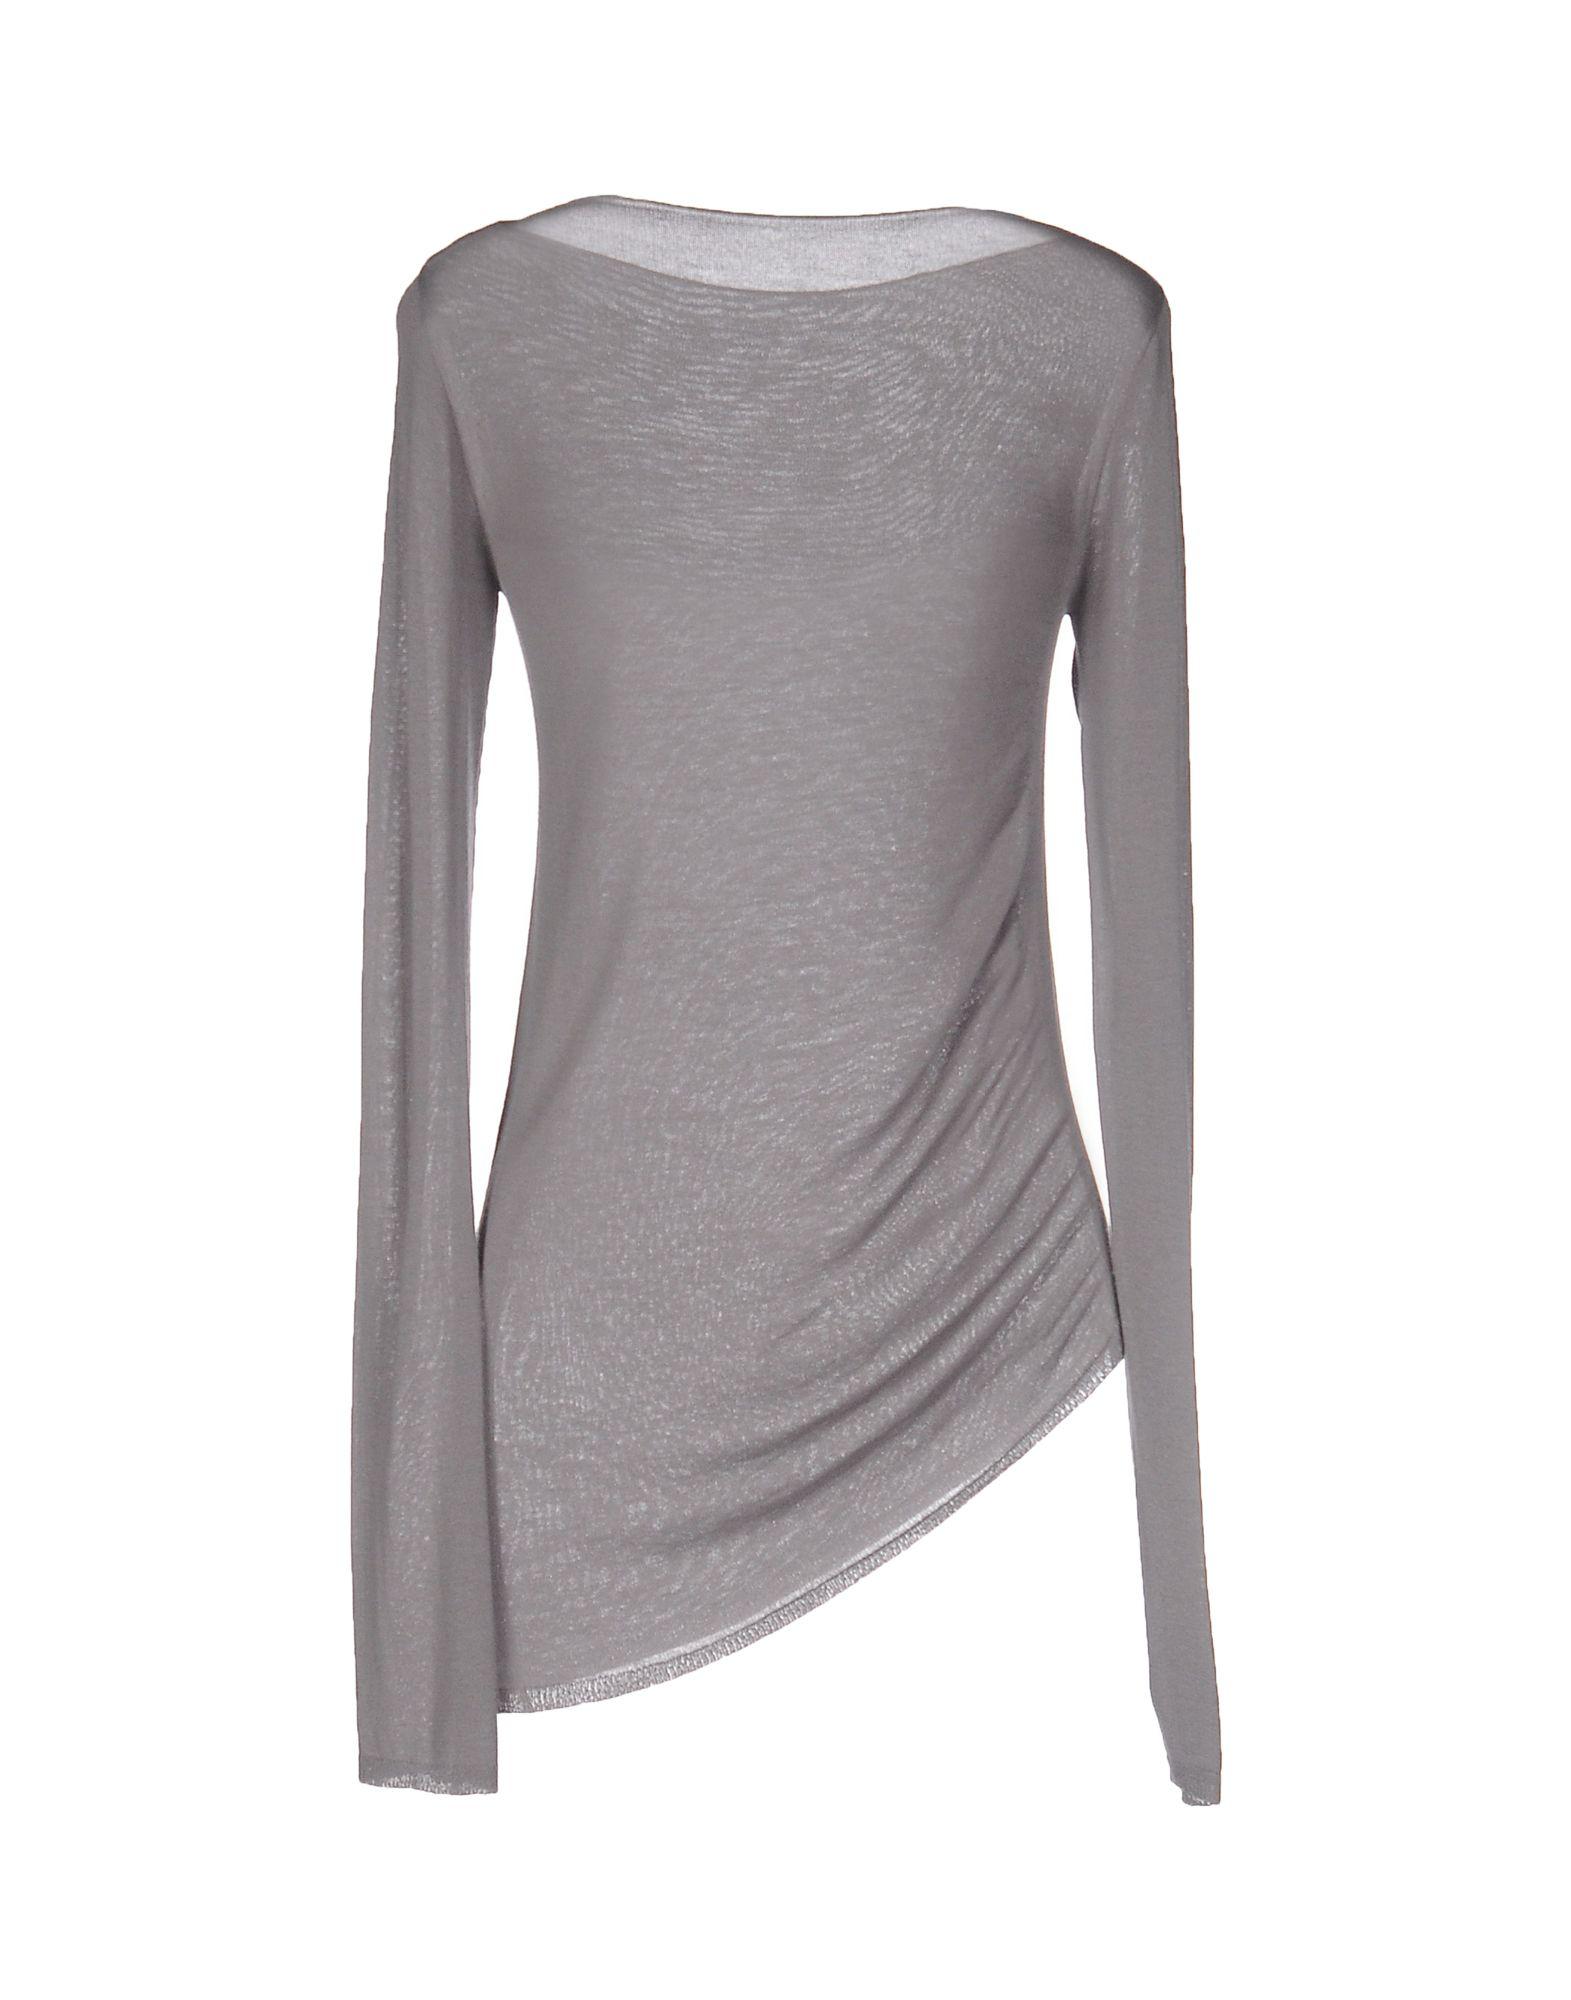 emporio armani sweater in gray lyst. Black Bedroom Furniture Sets. Home Design Ideas